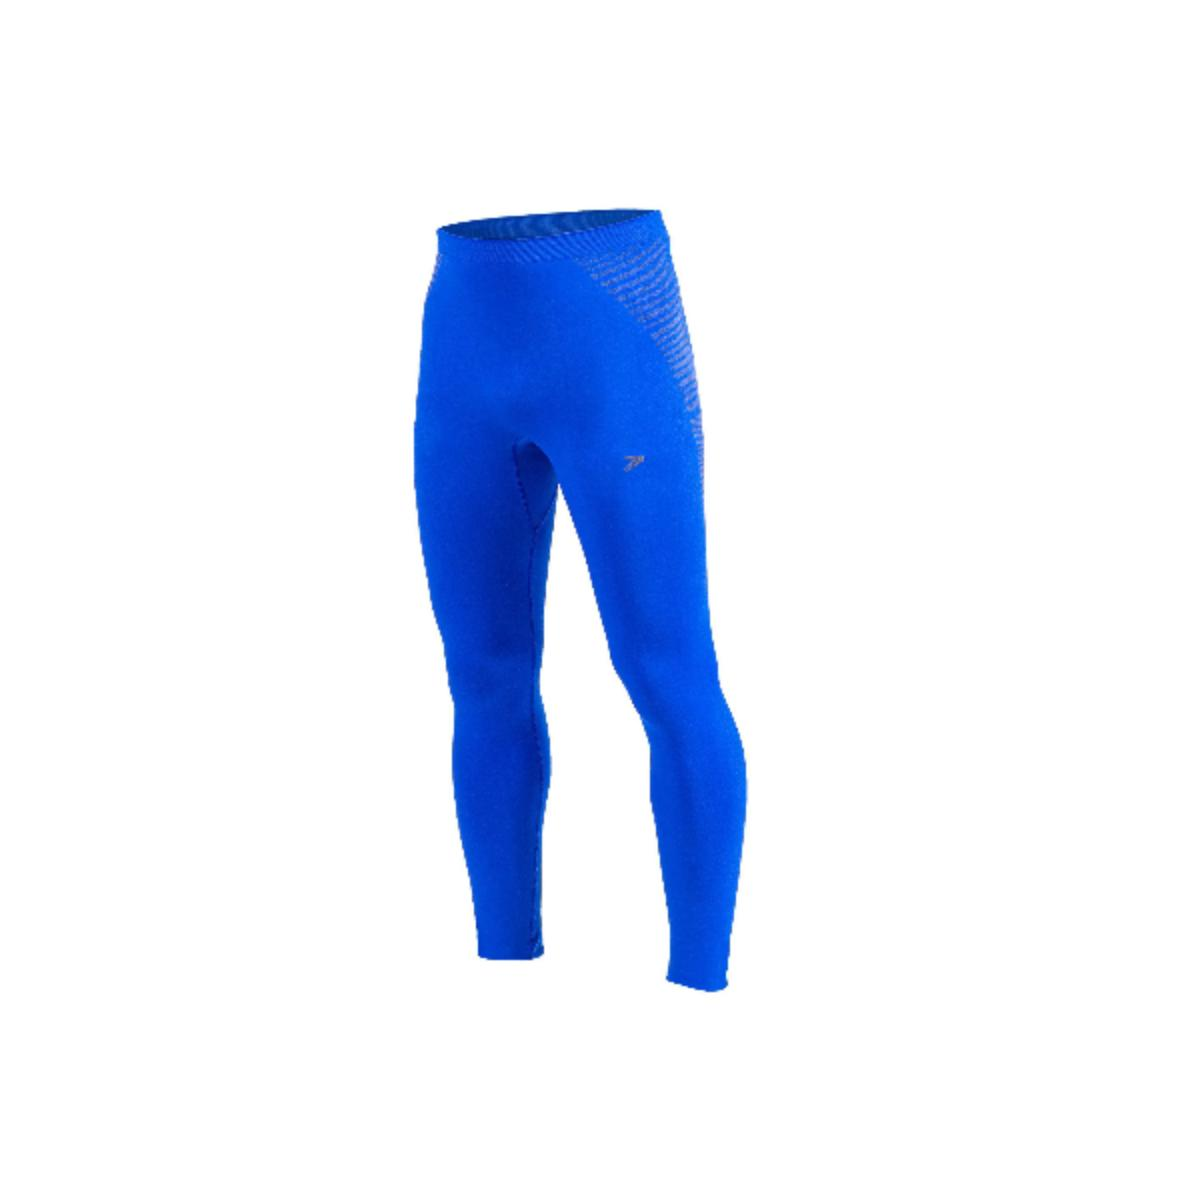 Calça Masculina Poker 03777 Skin Power Plus X-ray  Azul